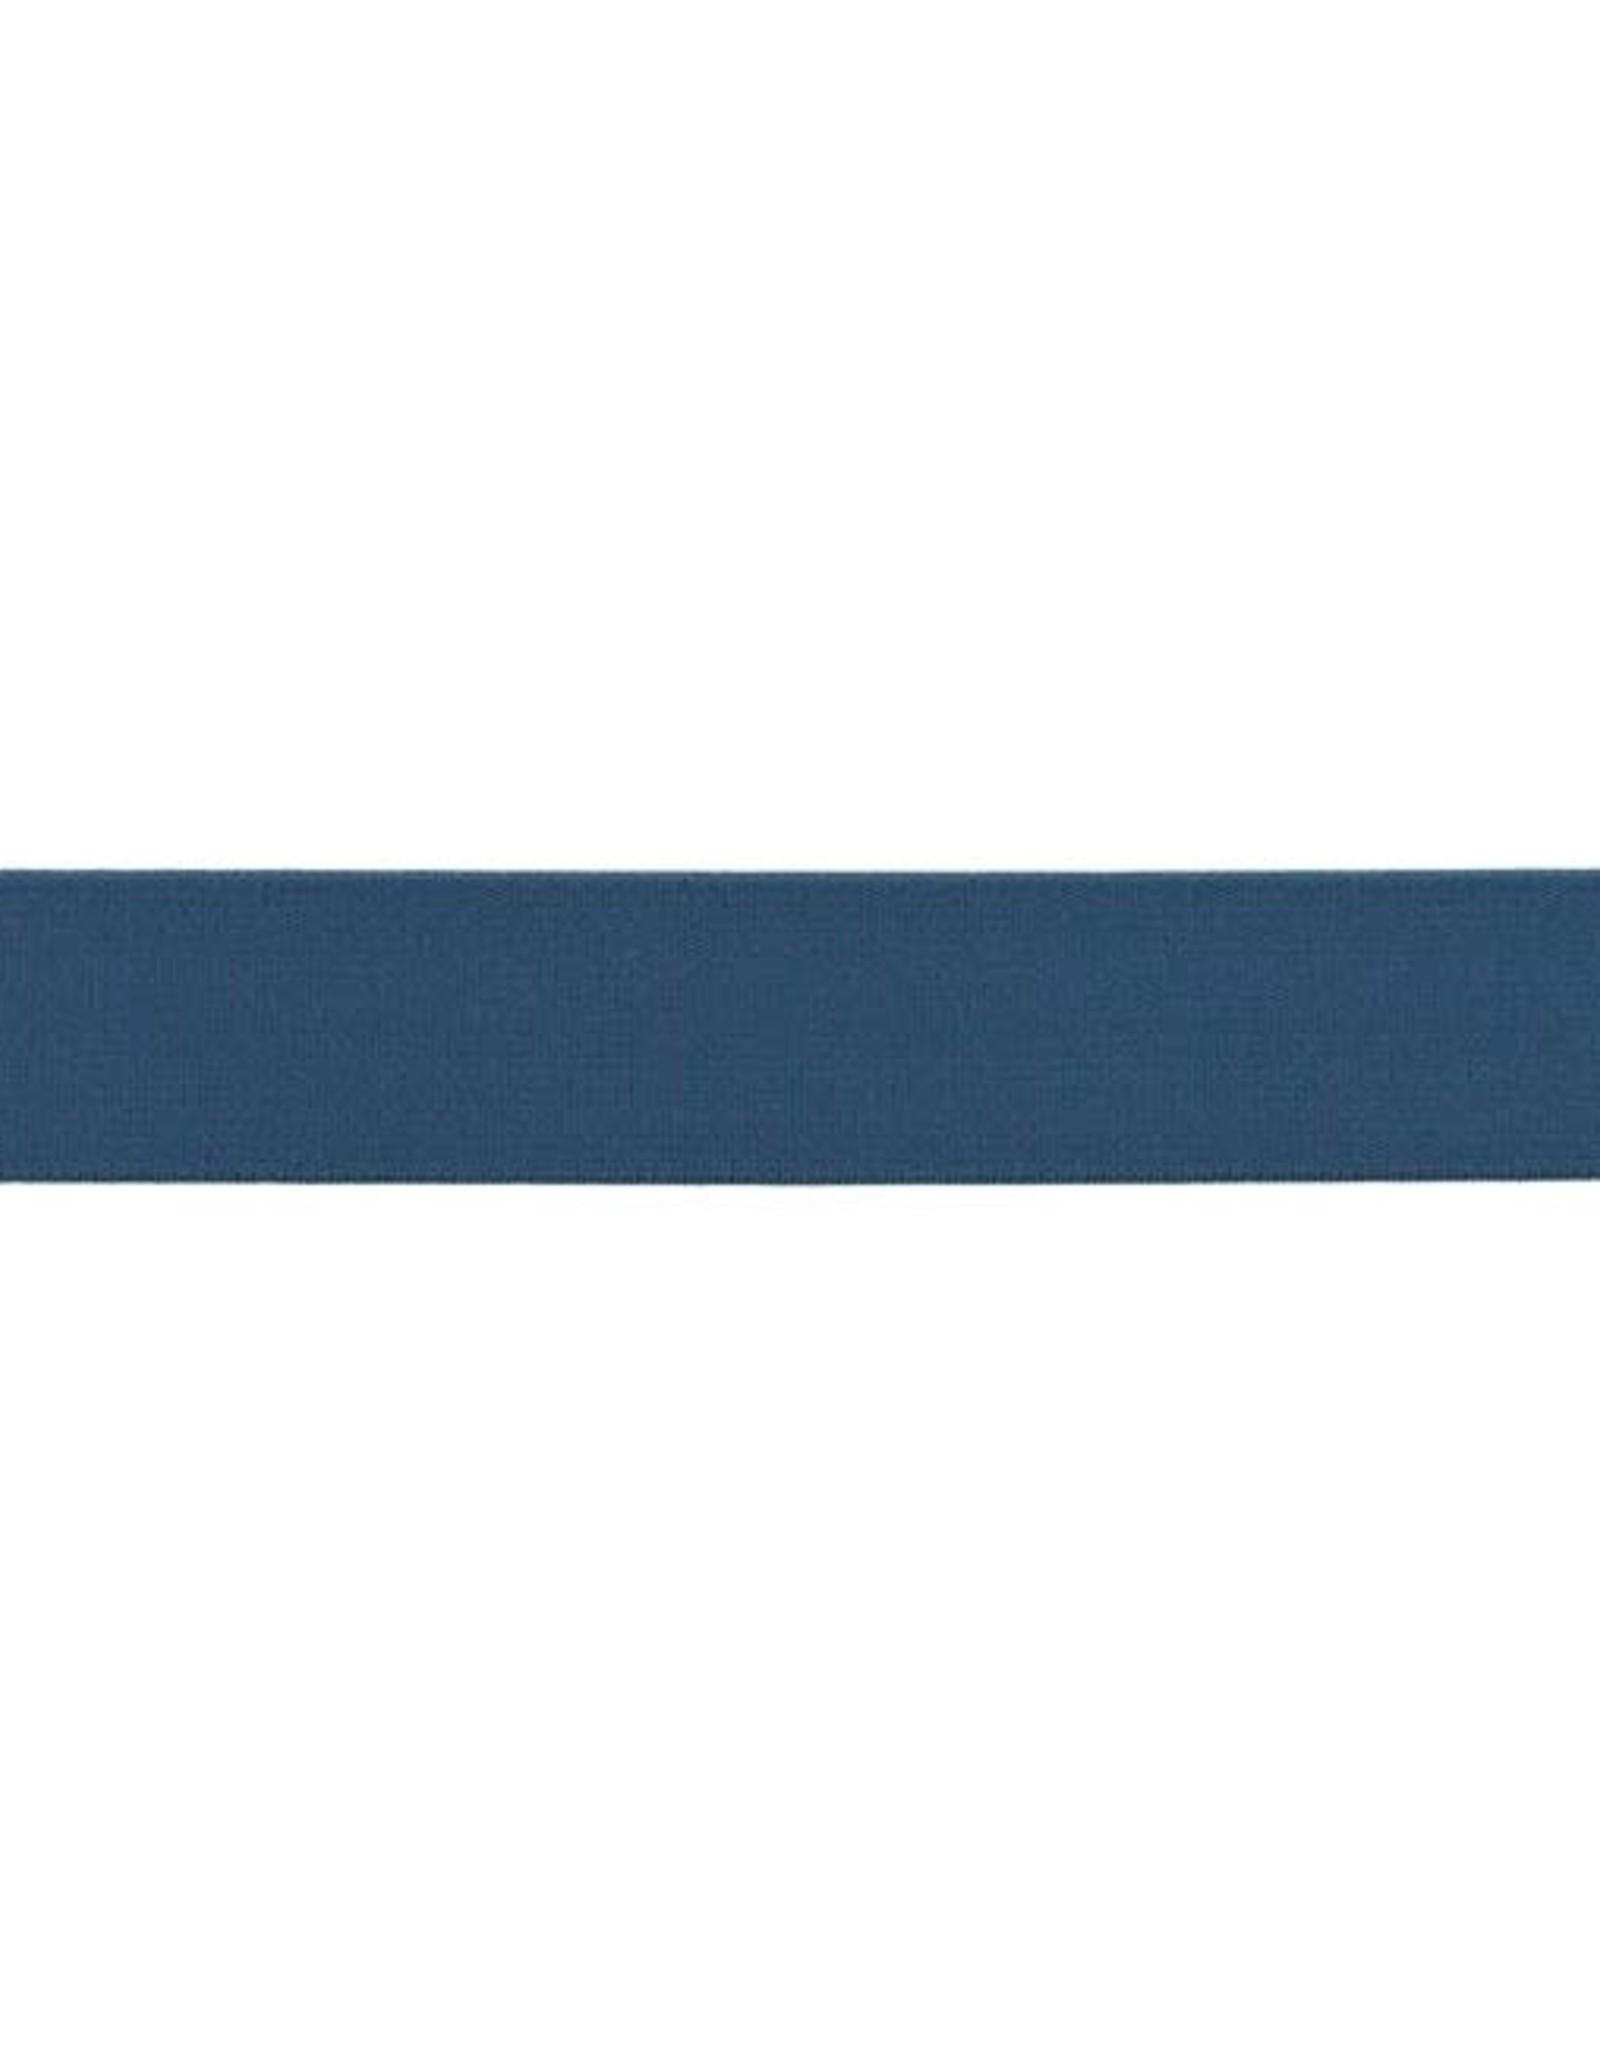 Soft elastiek 25mm - Jeansblauw